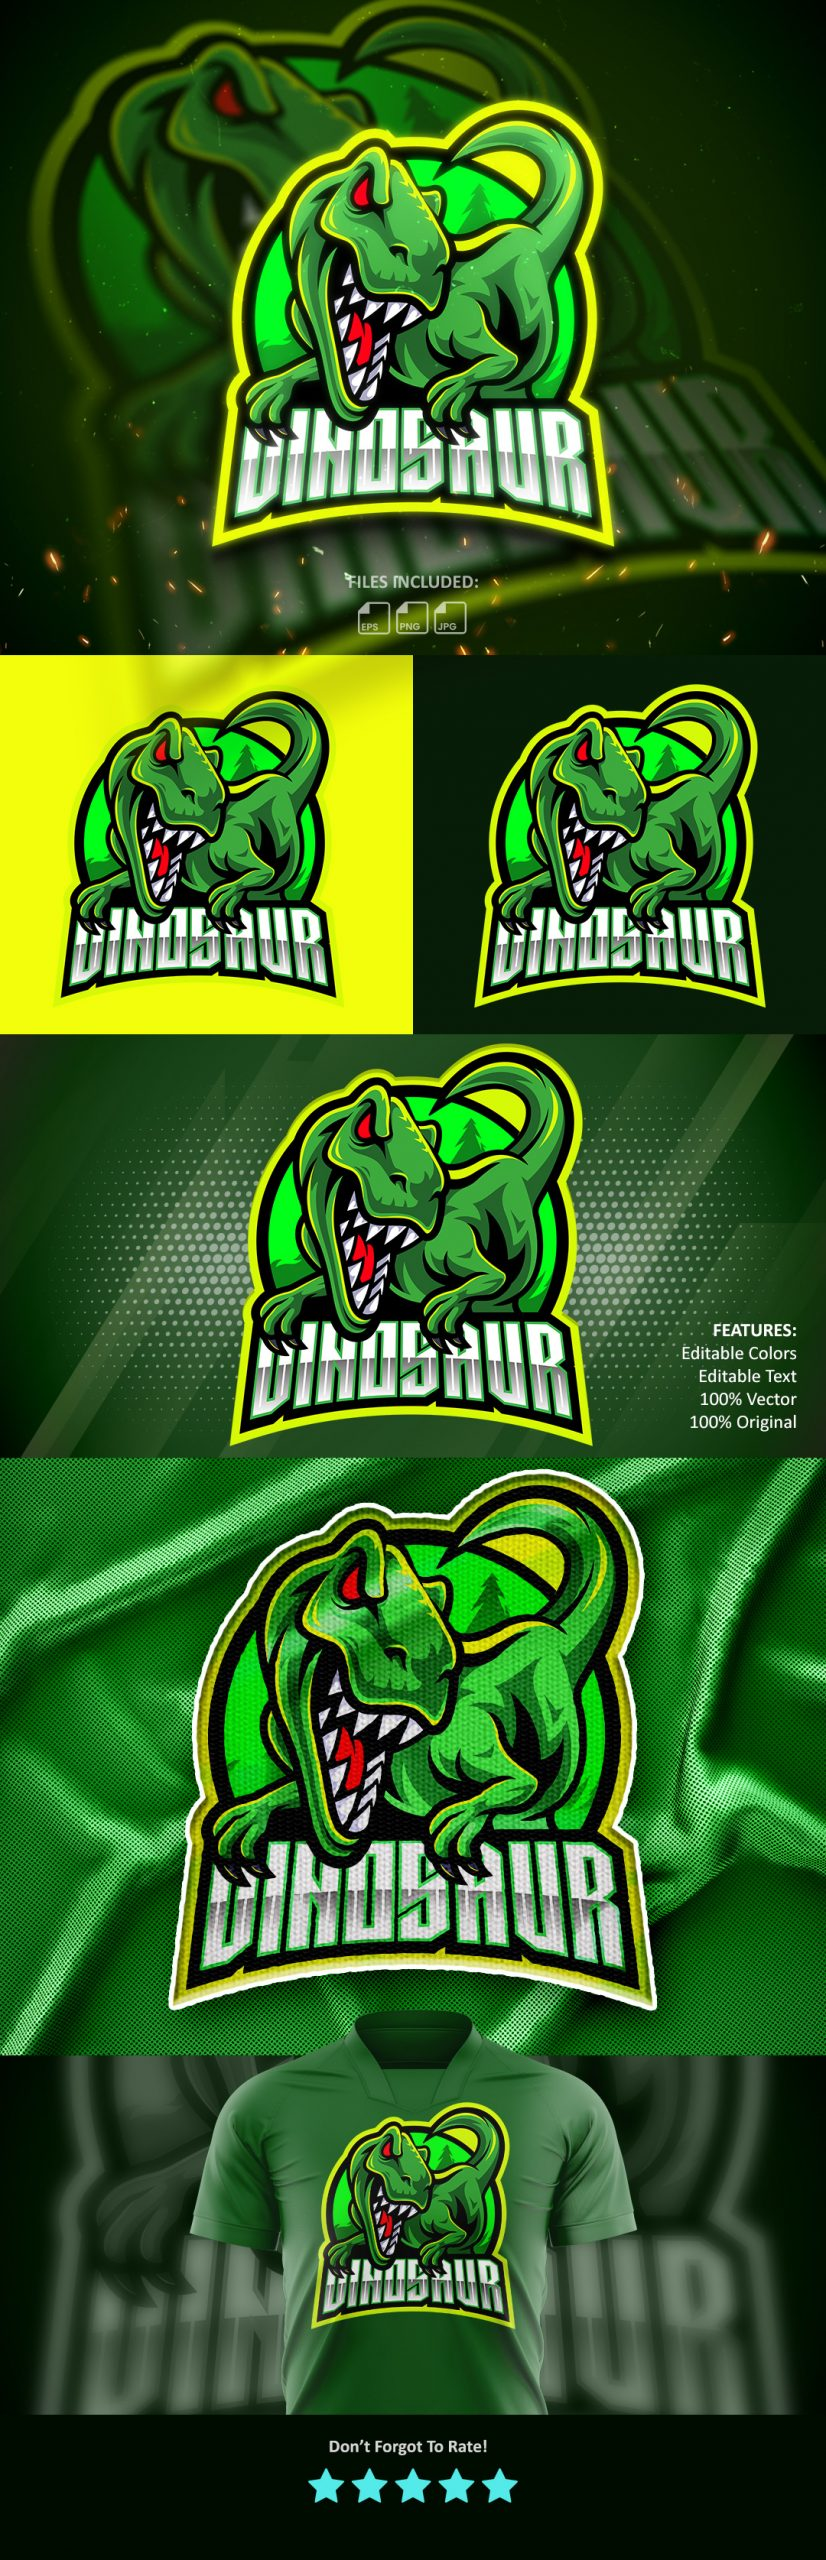 Dinosaur-Esports-Mascot-Logo-Free-Download